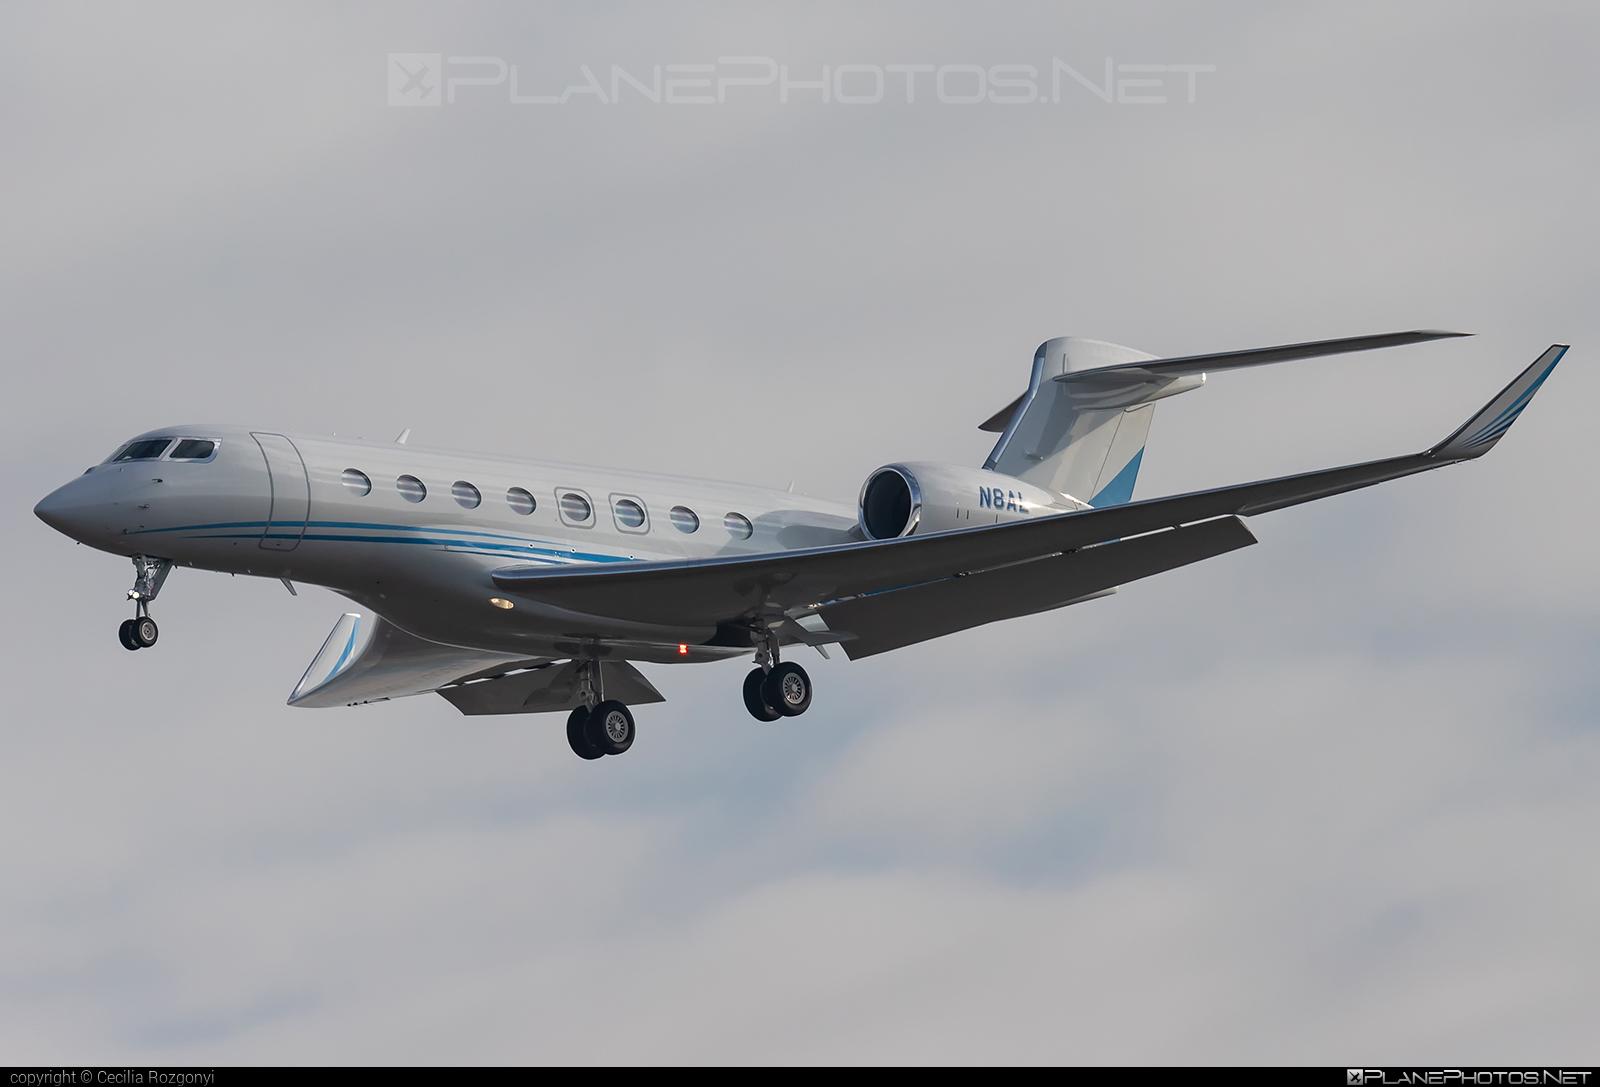 Gulfstream G650ER - N8AL operated by Private operator #gulfstream #gulfstream650 #gulfstream650er #gulfstreamg650 #gulfstreamgvi